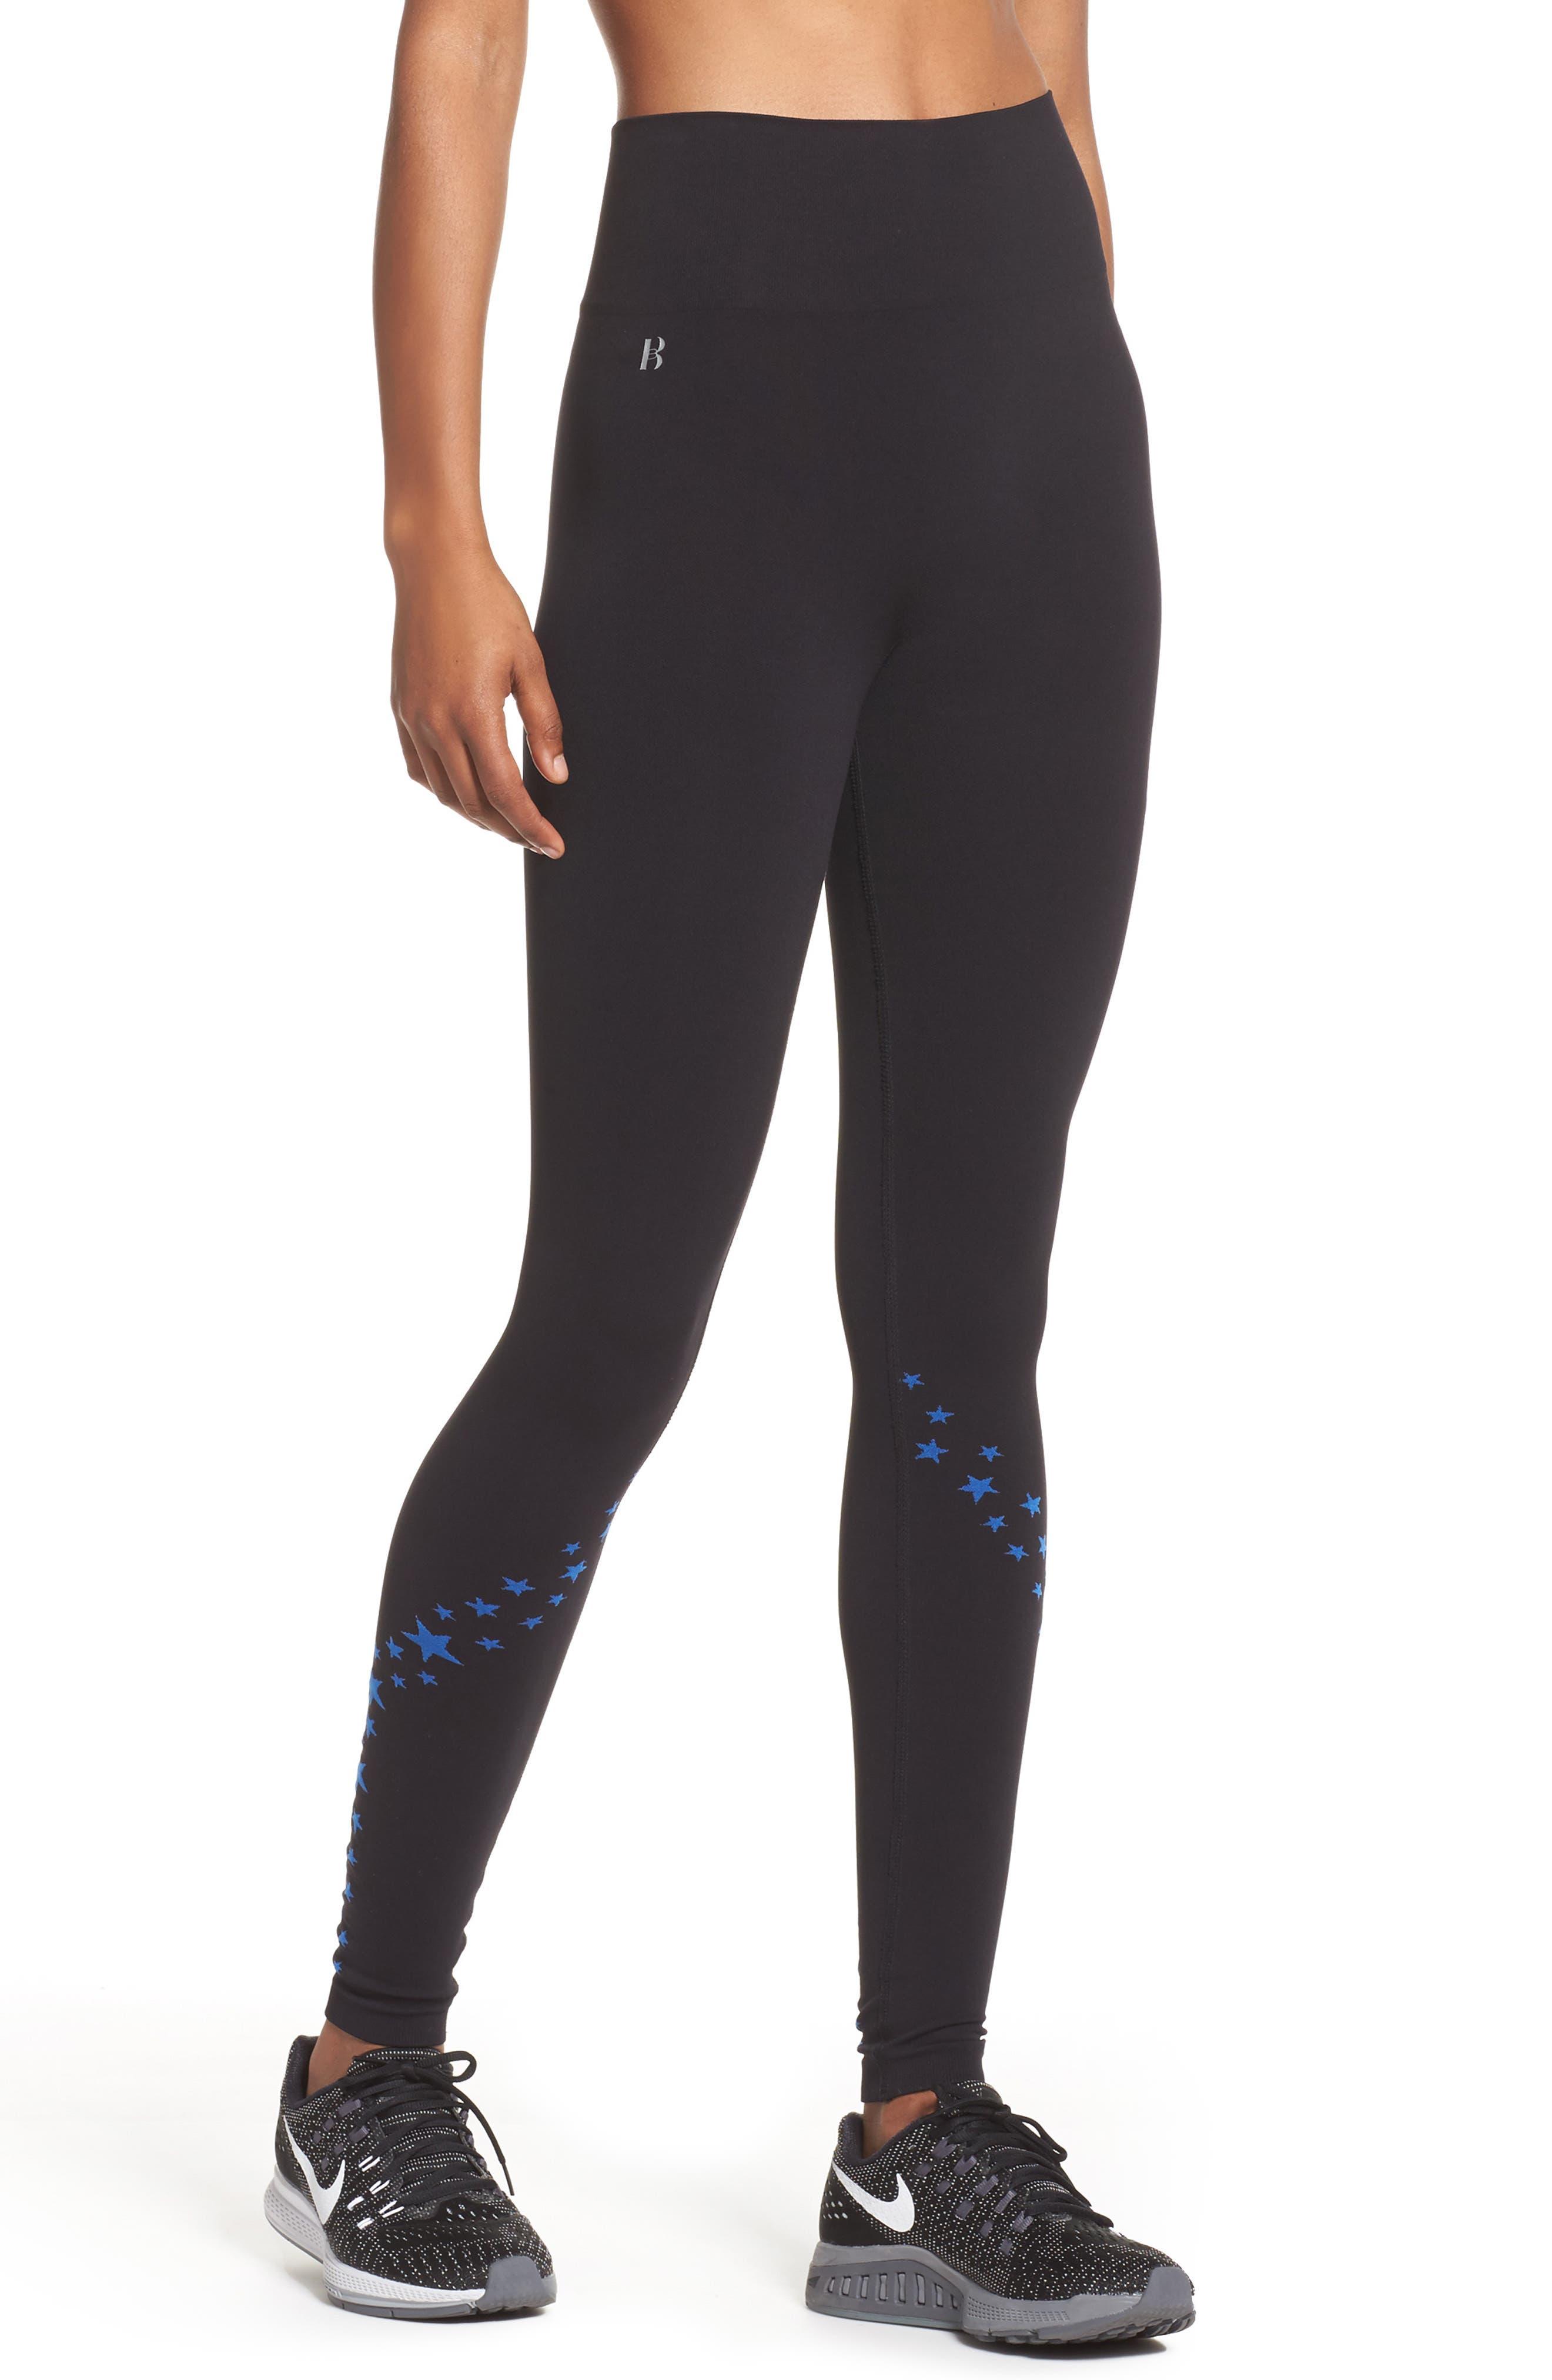 BoomBoom Athletica Seamless Star Leggings,                         Main,                         color, Black/Cobalt